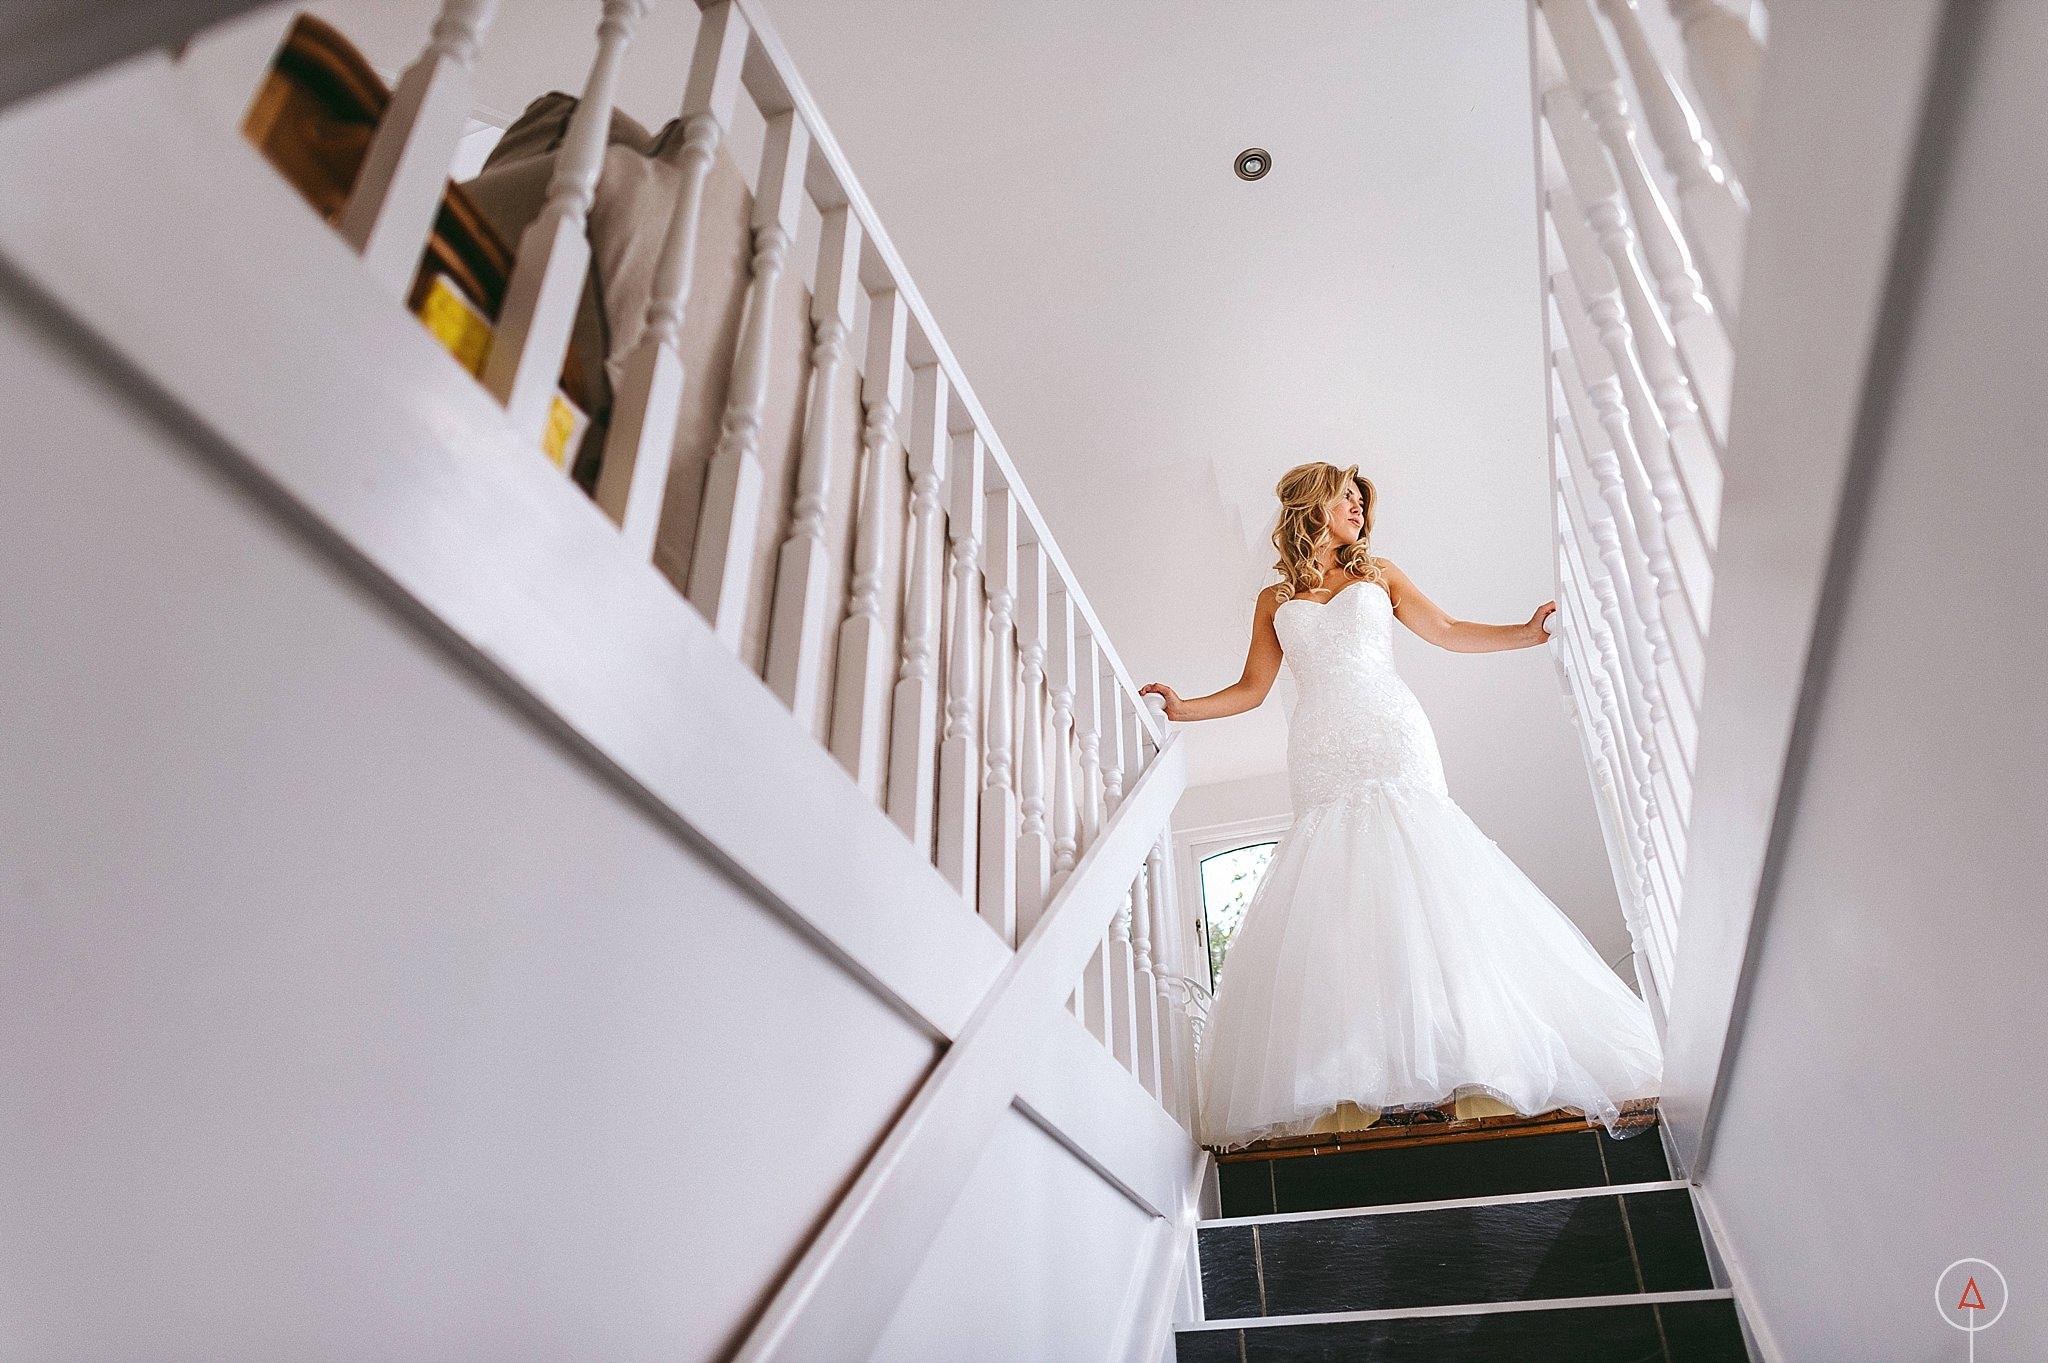 cardiff-wedding-photographer-aga-tomaszek_0349